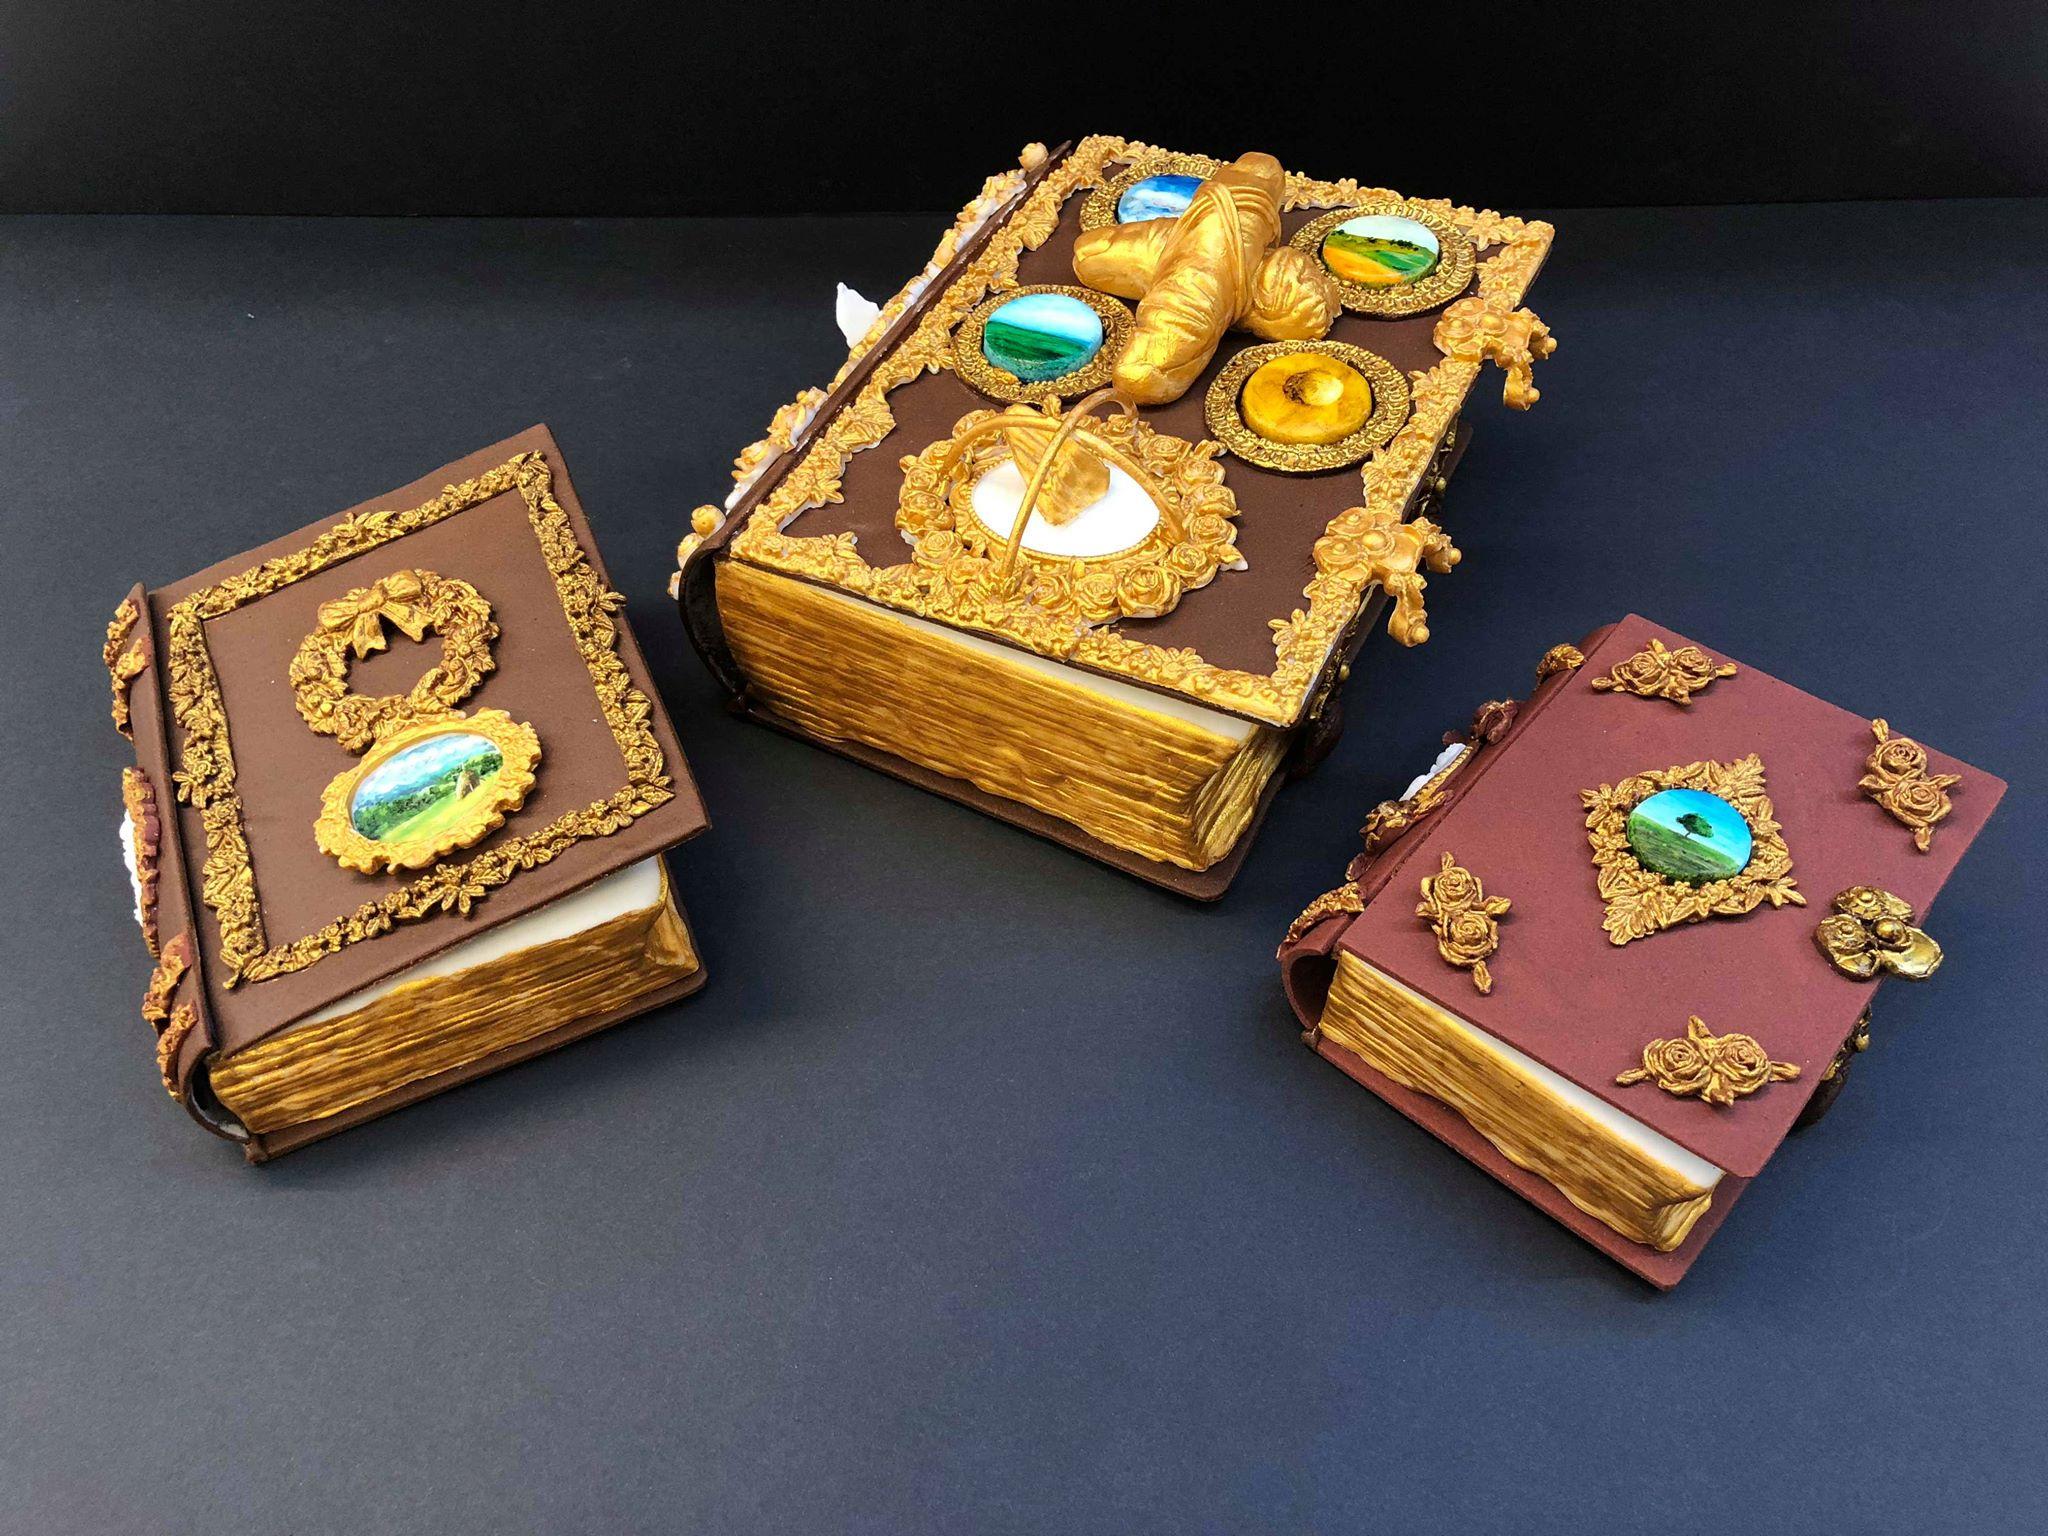 sweet-art-gifts-2910 (6)